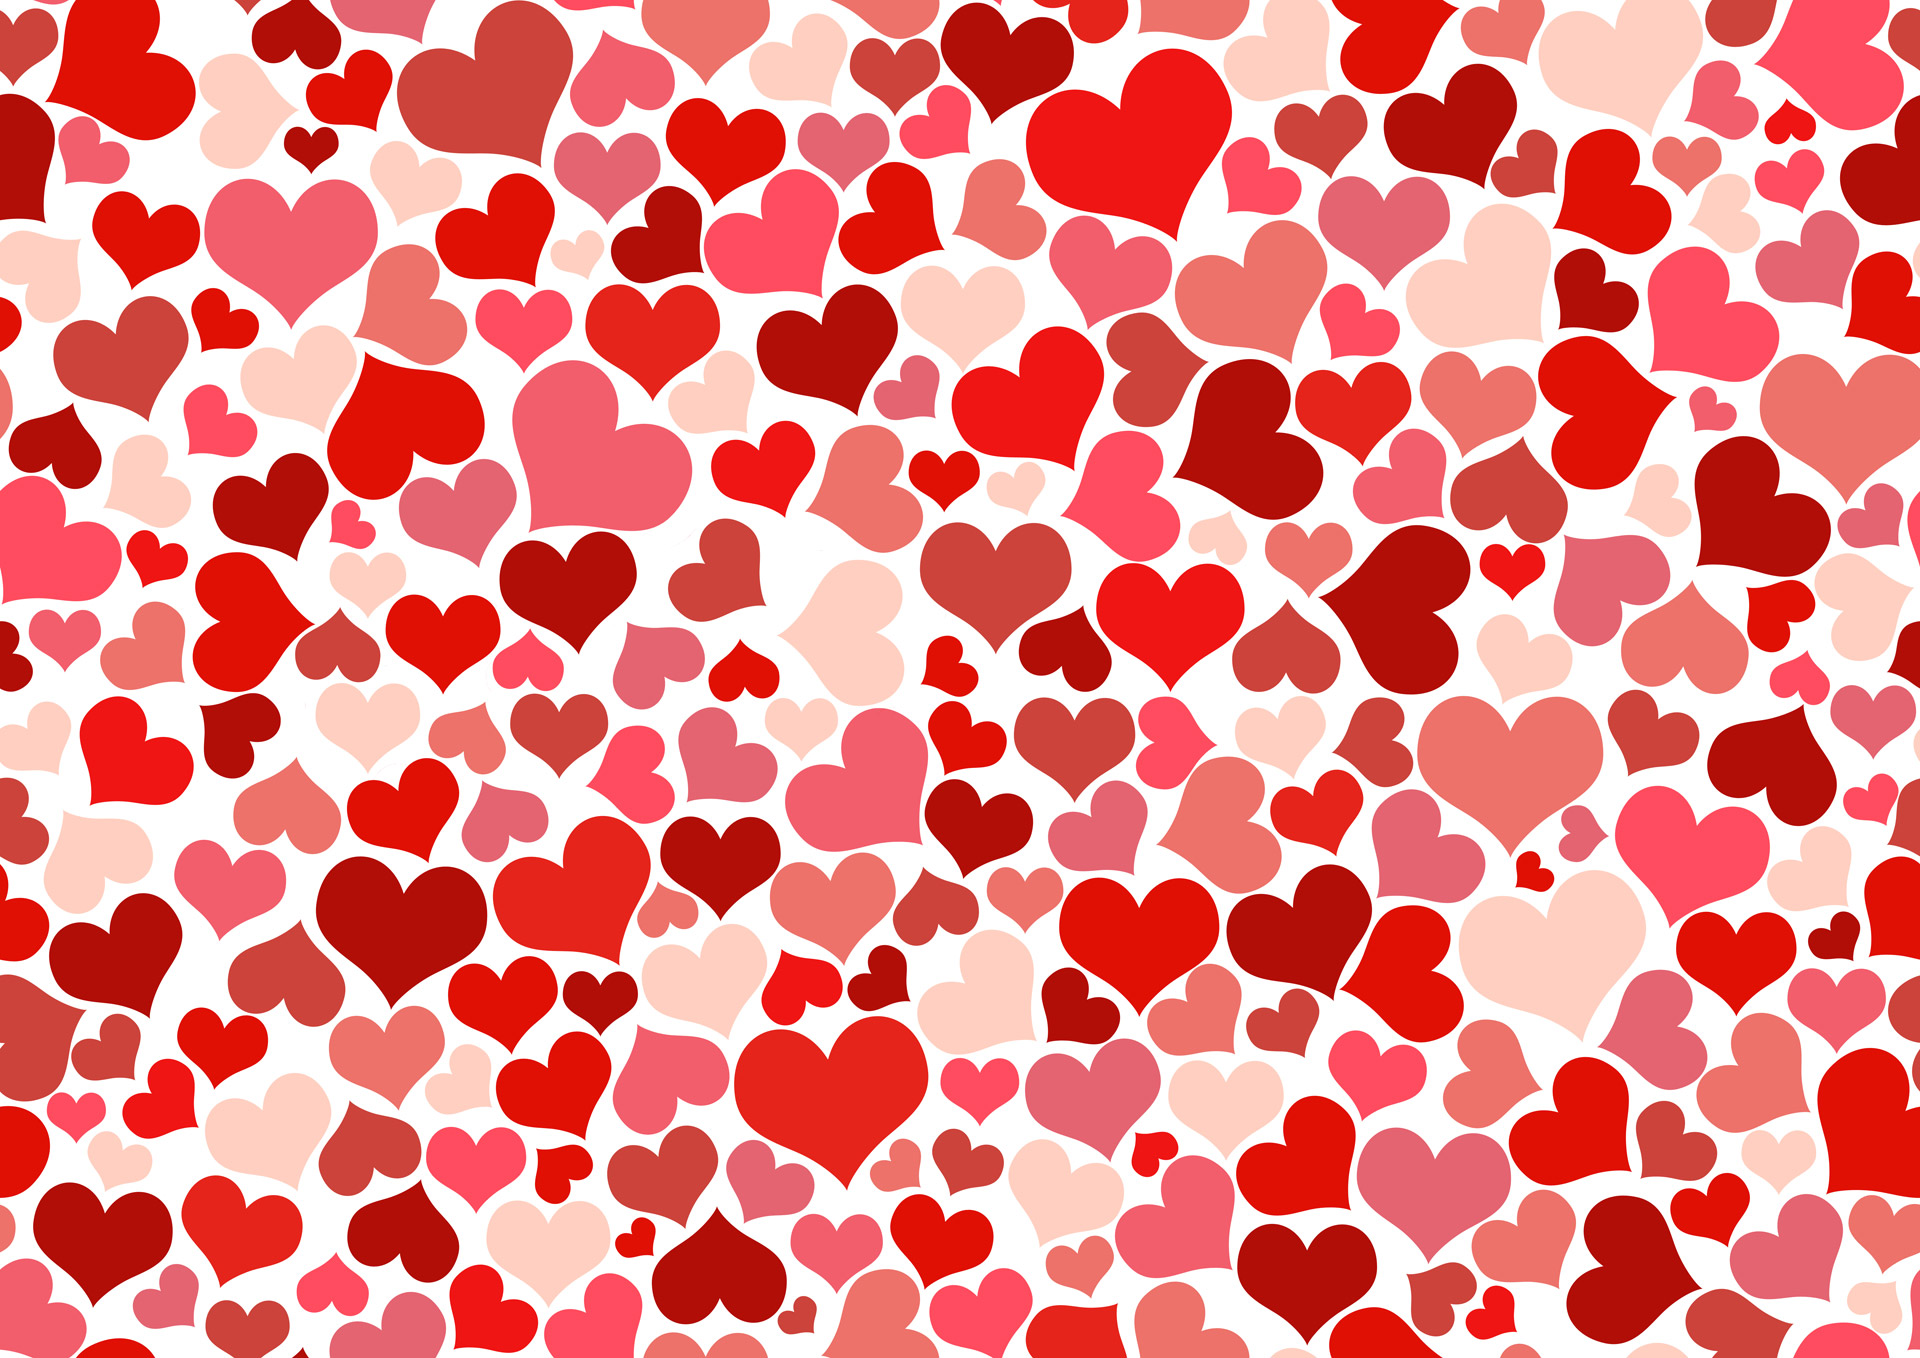 Hearts Wallpaper Stock Photo HD   Public Domain Pictures 1920x1358